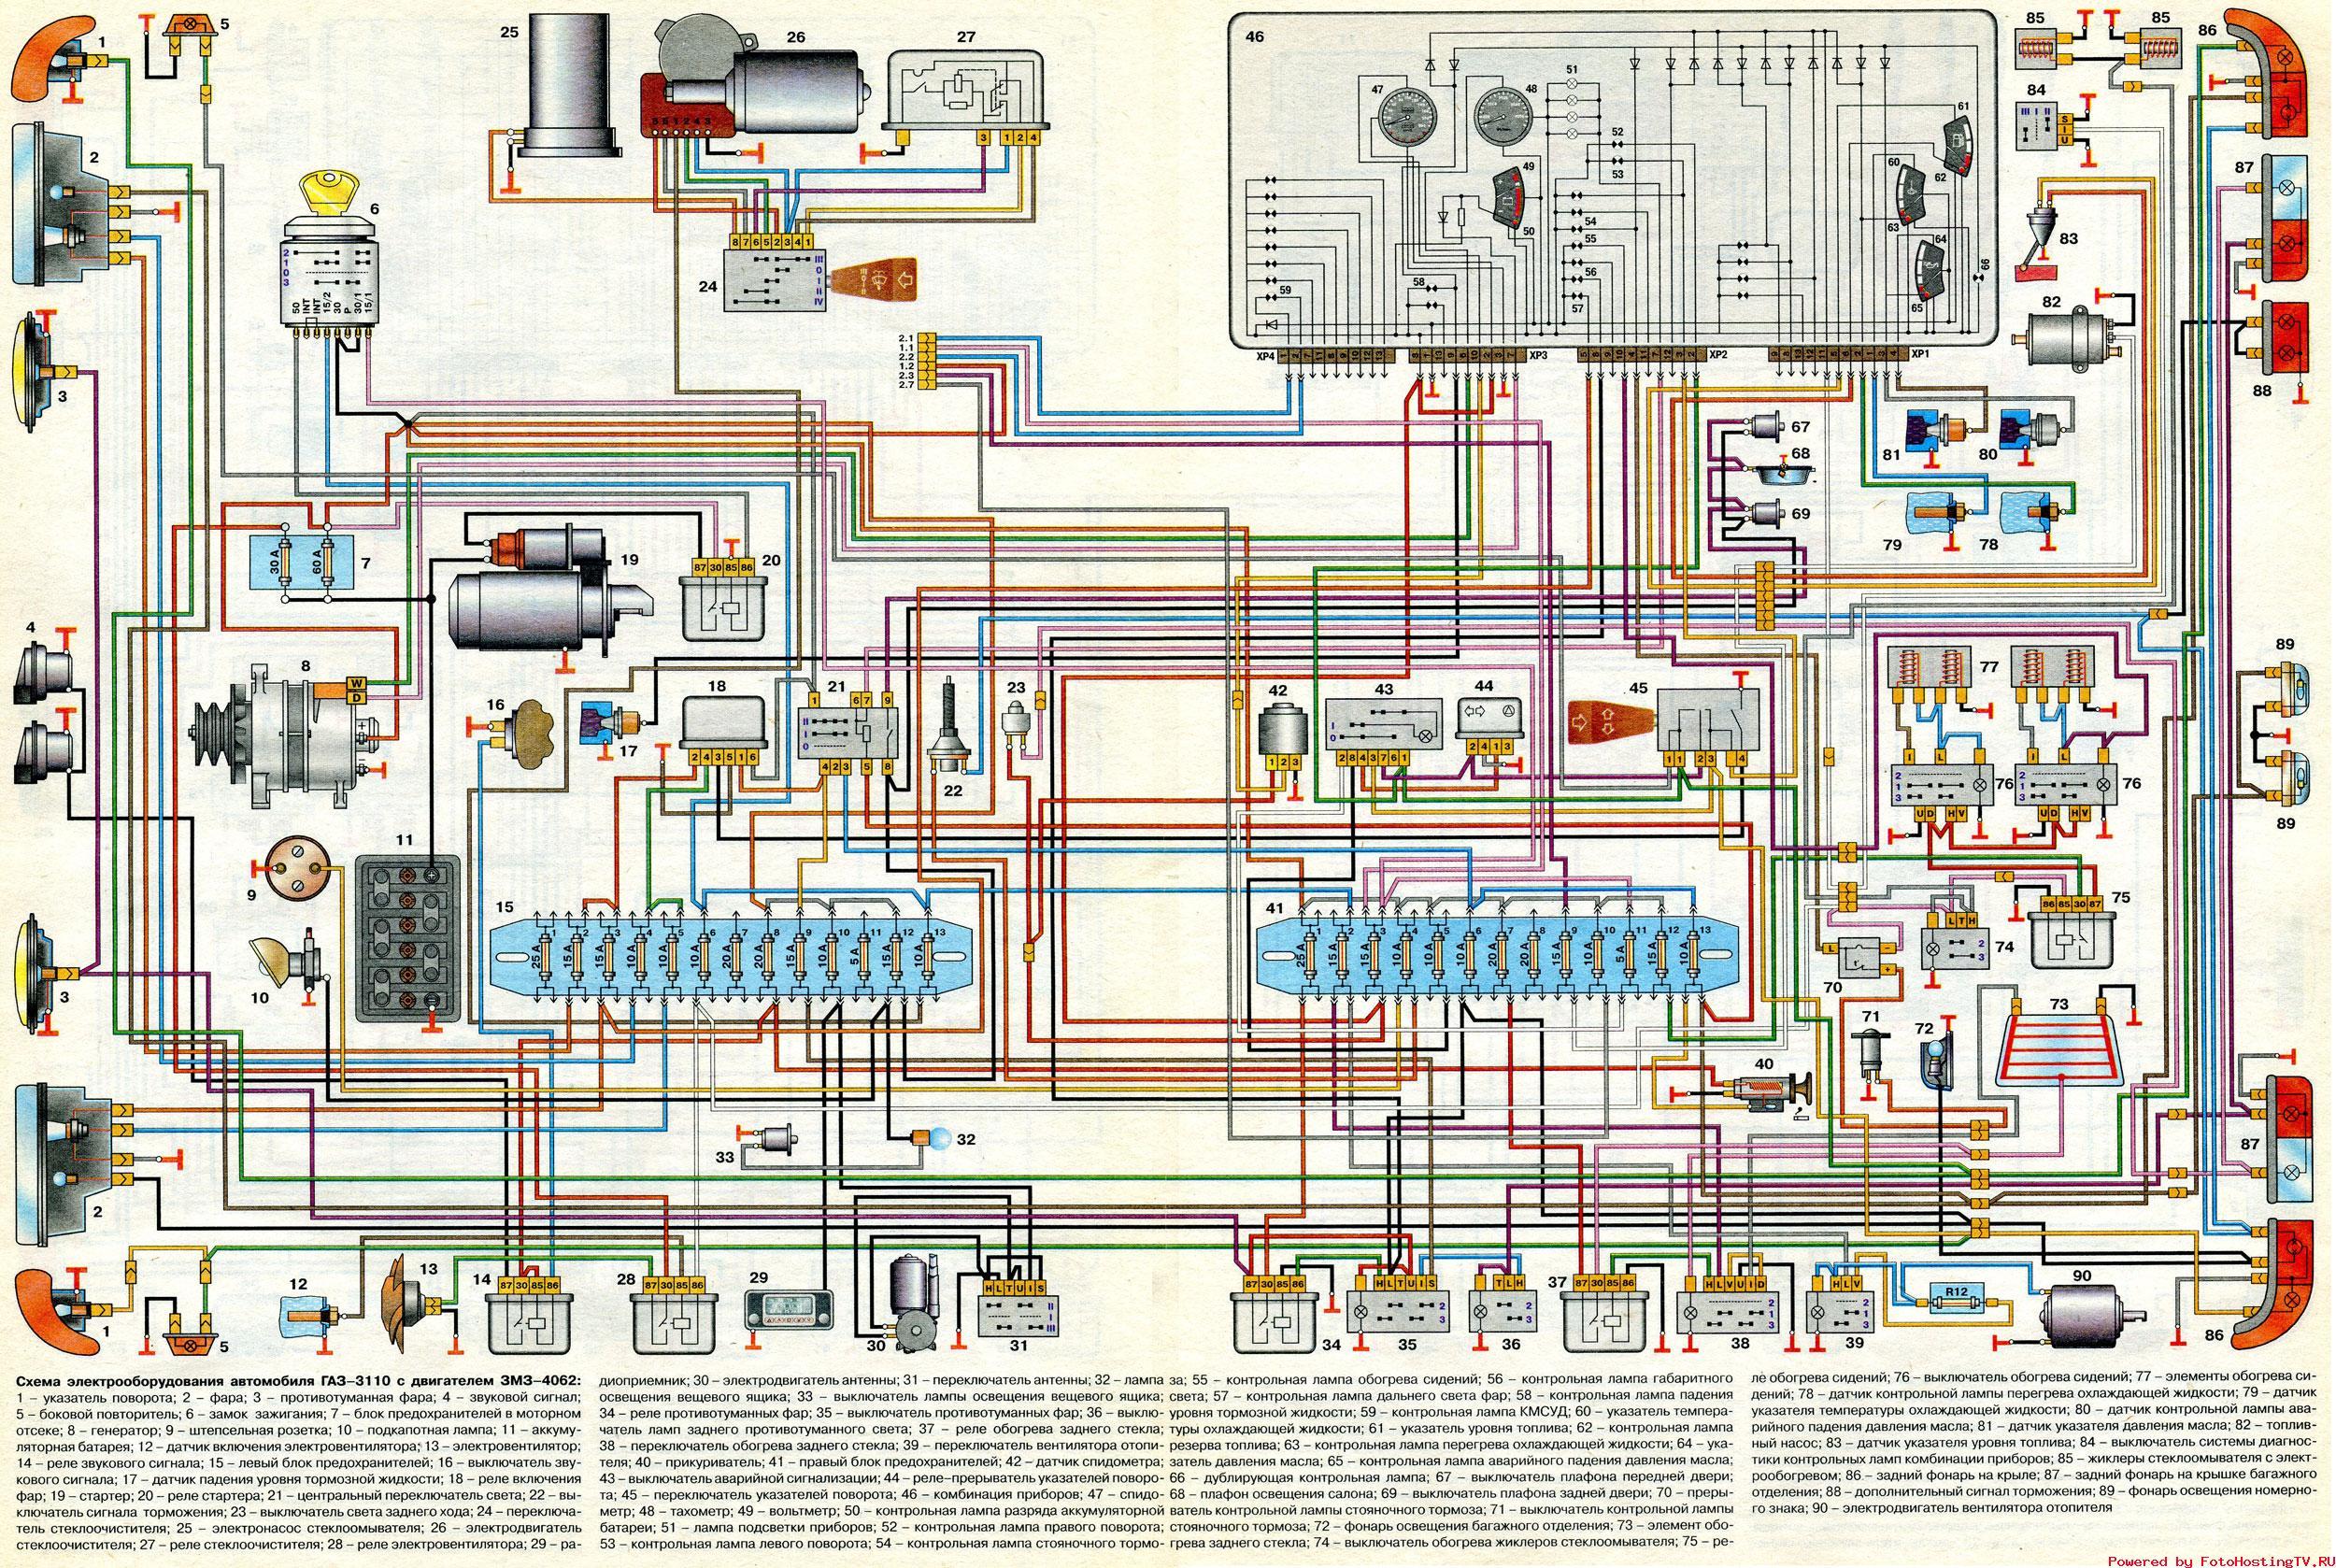 Схема ГАЗ 3110